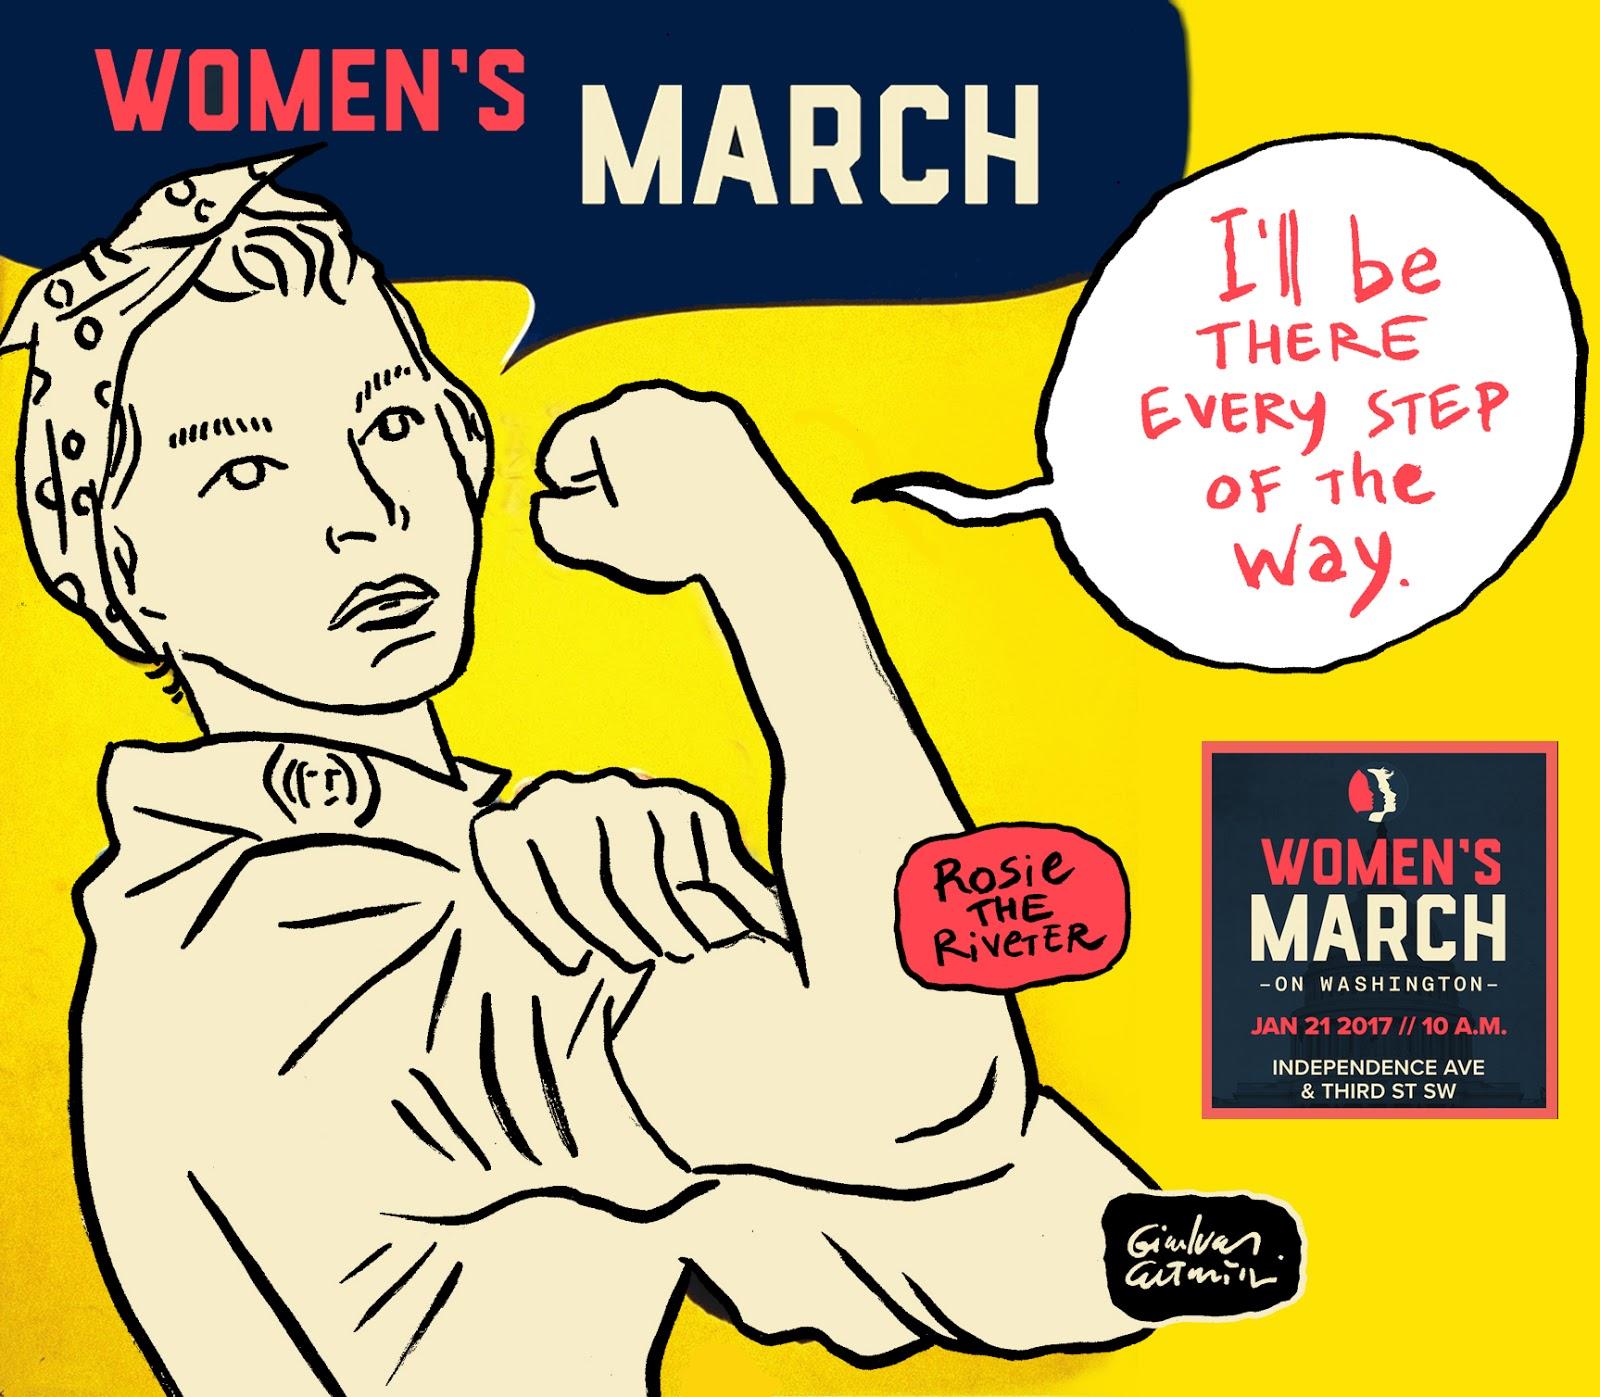 Women's March - Rosie the Riveter